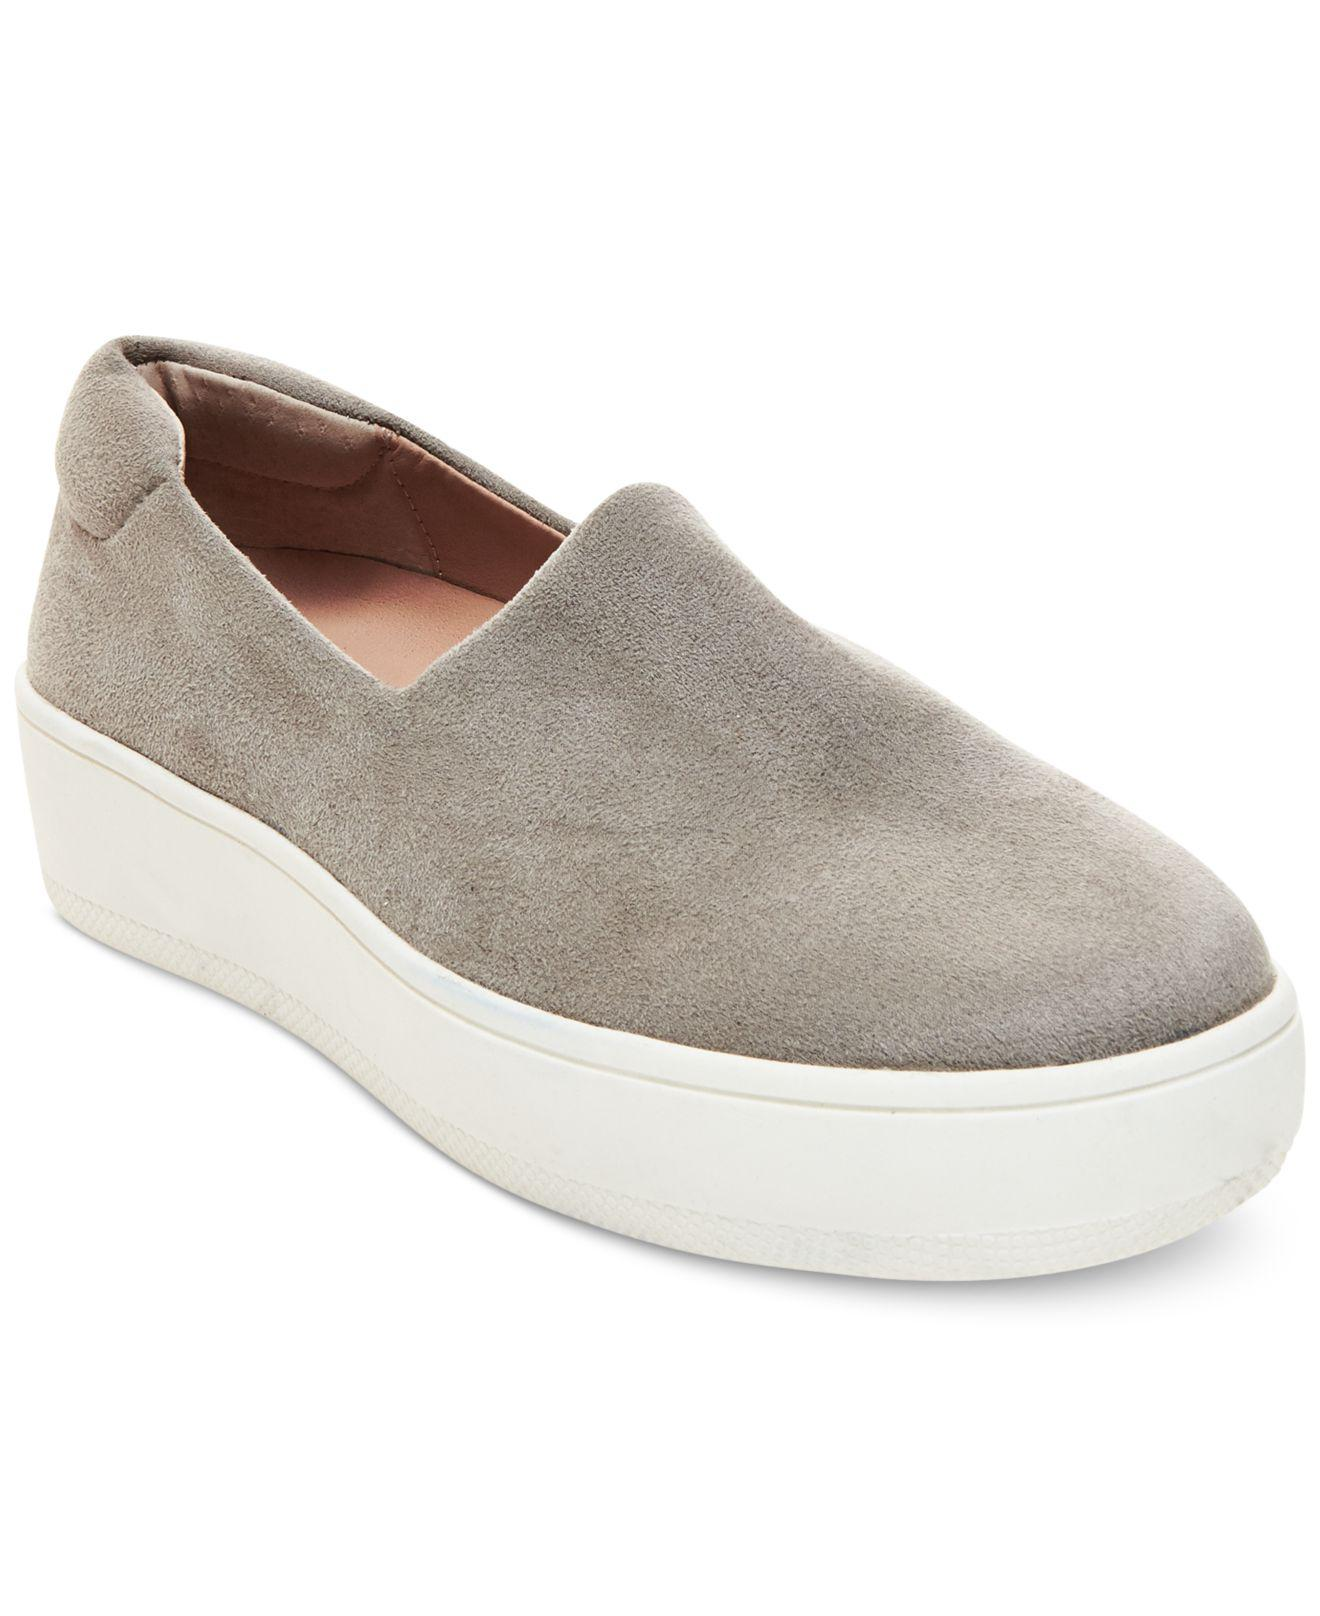 022269caf6f Lyst - Steven by Steve Madden Hilda Slip On Platform Sneakers in Gray